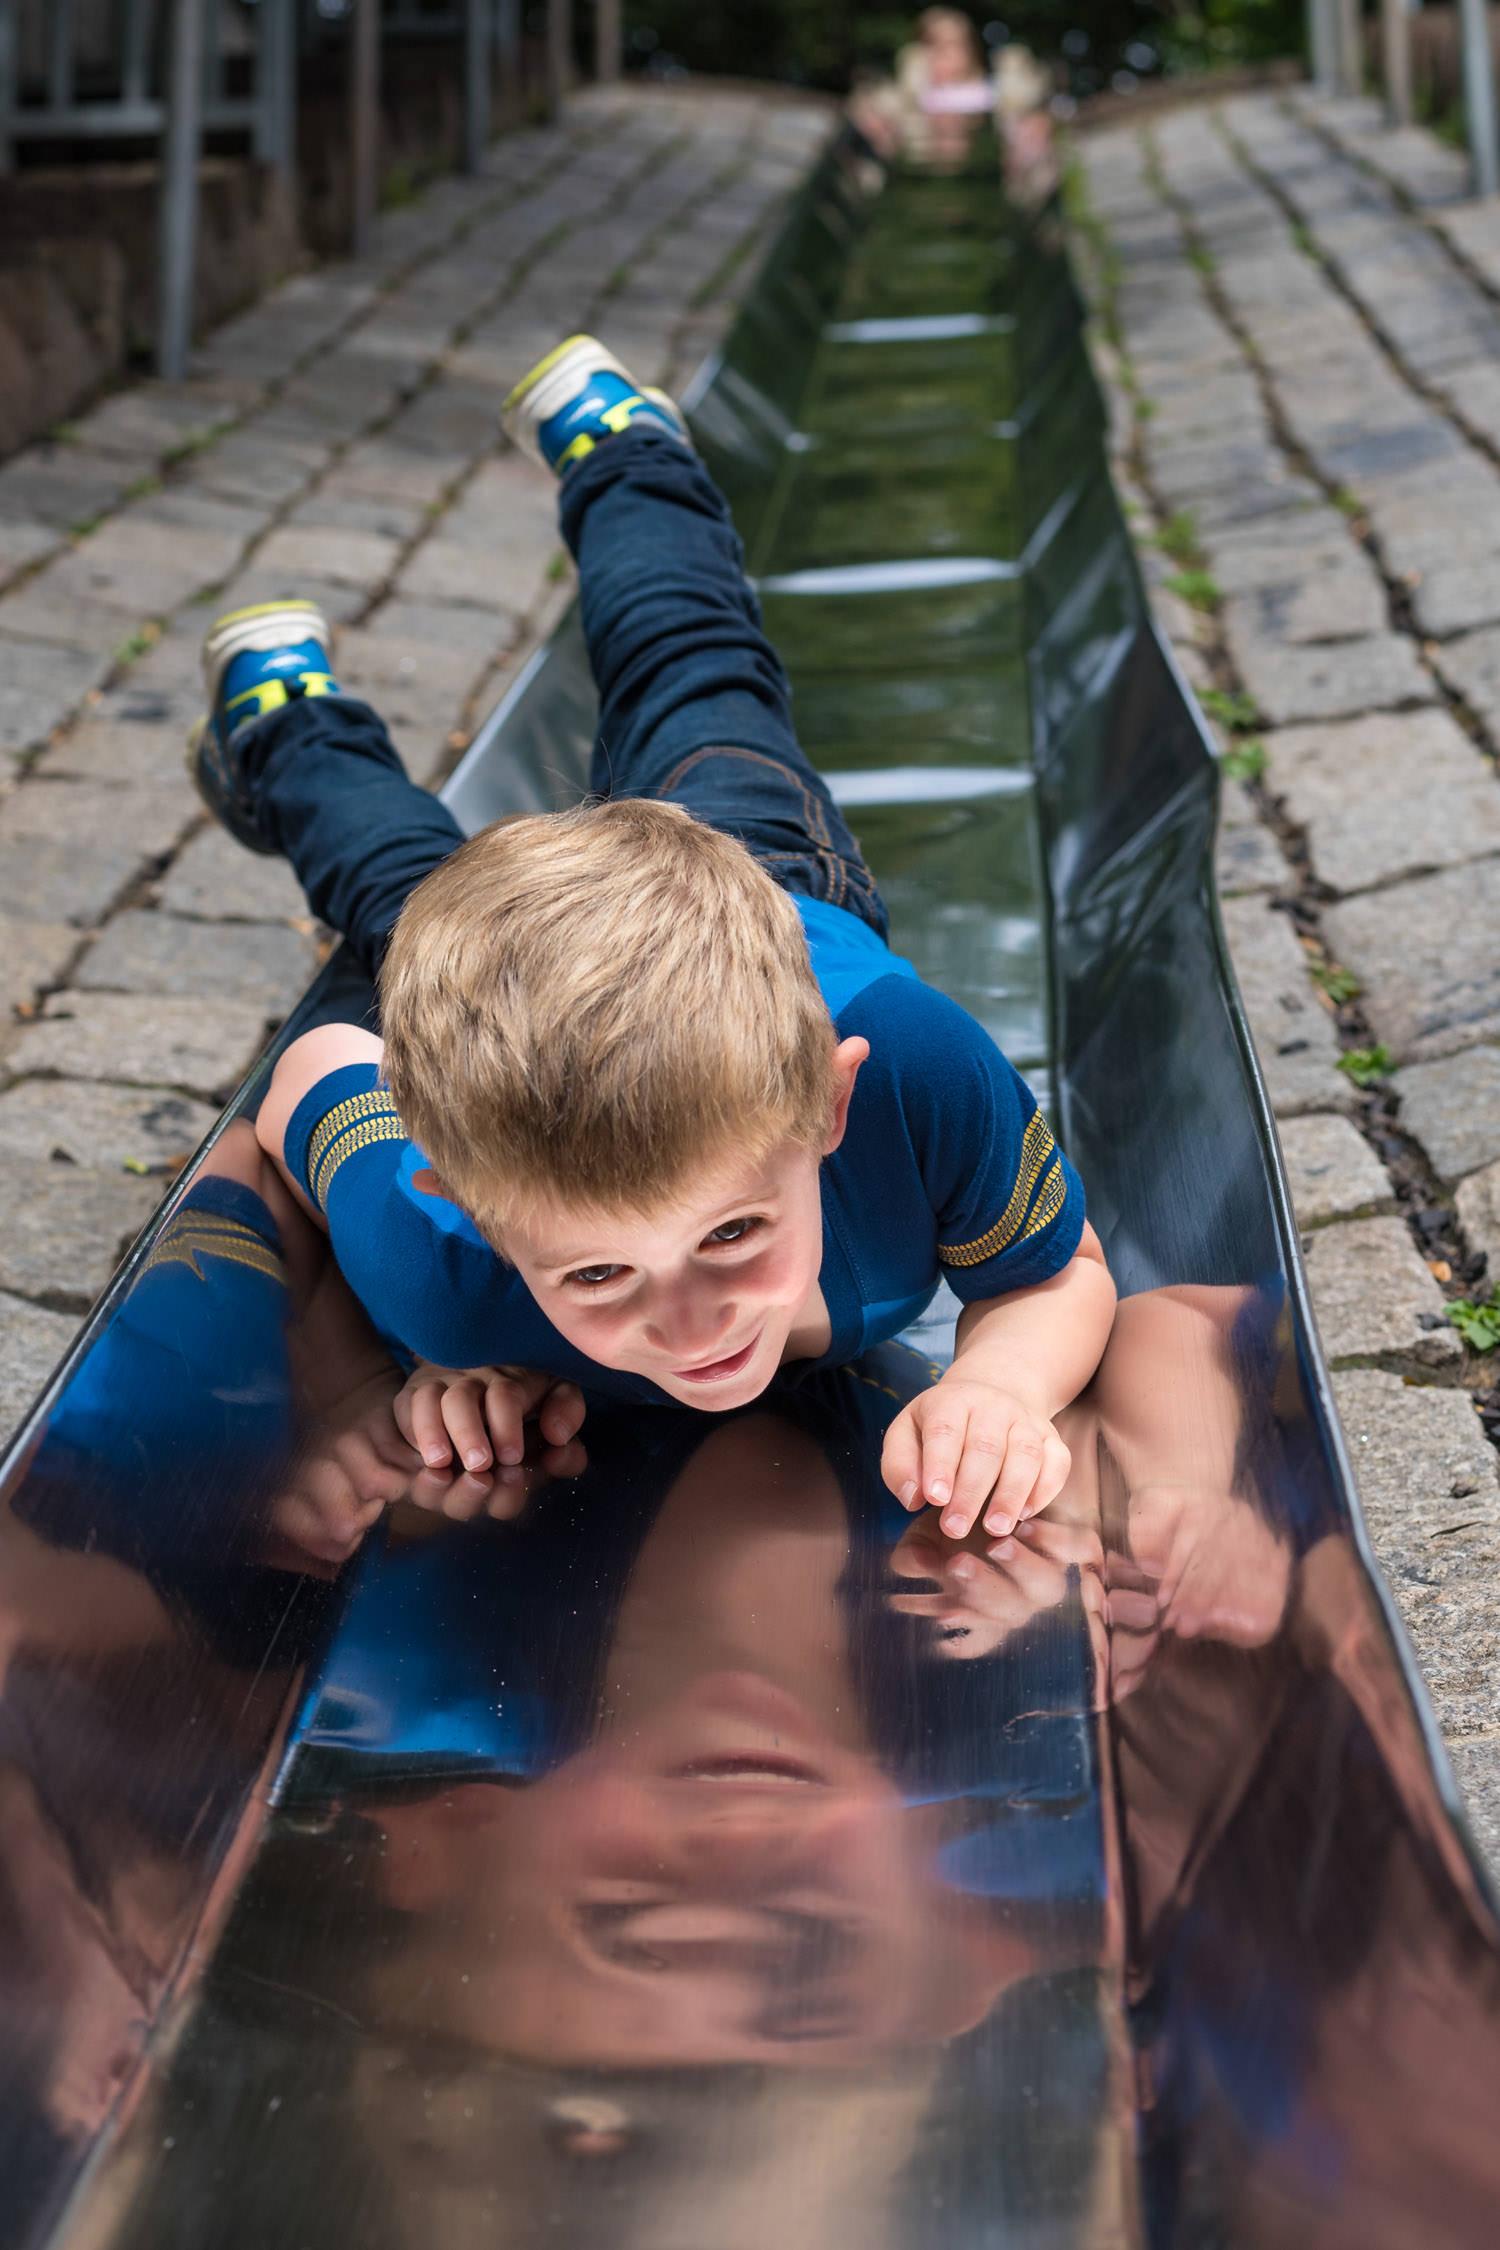 Boy coming down a shiny metal slide head first